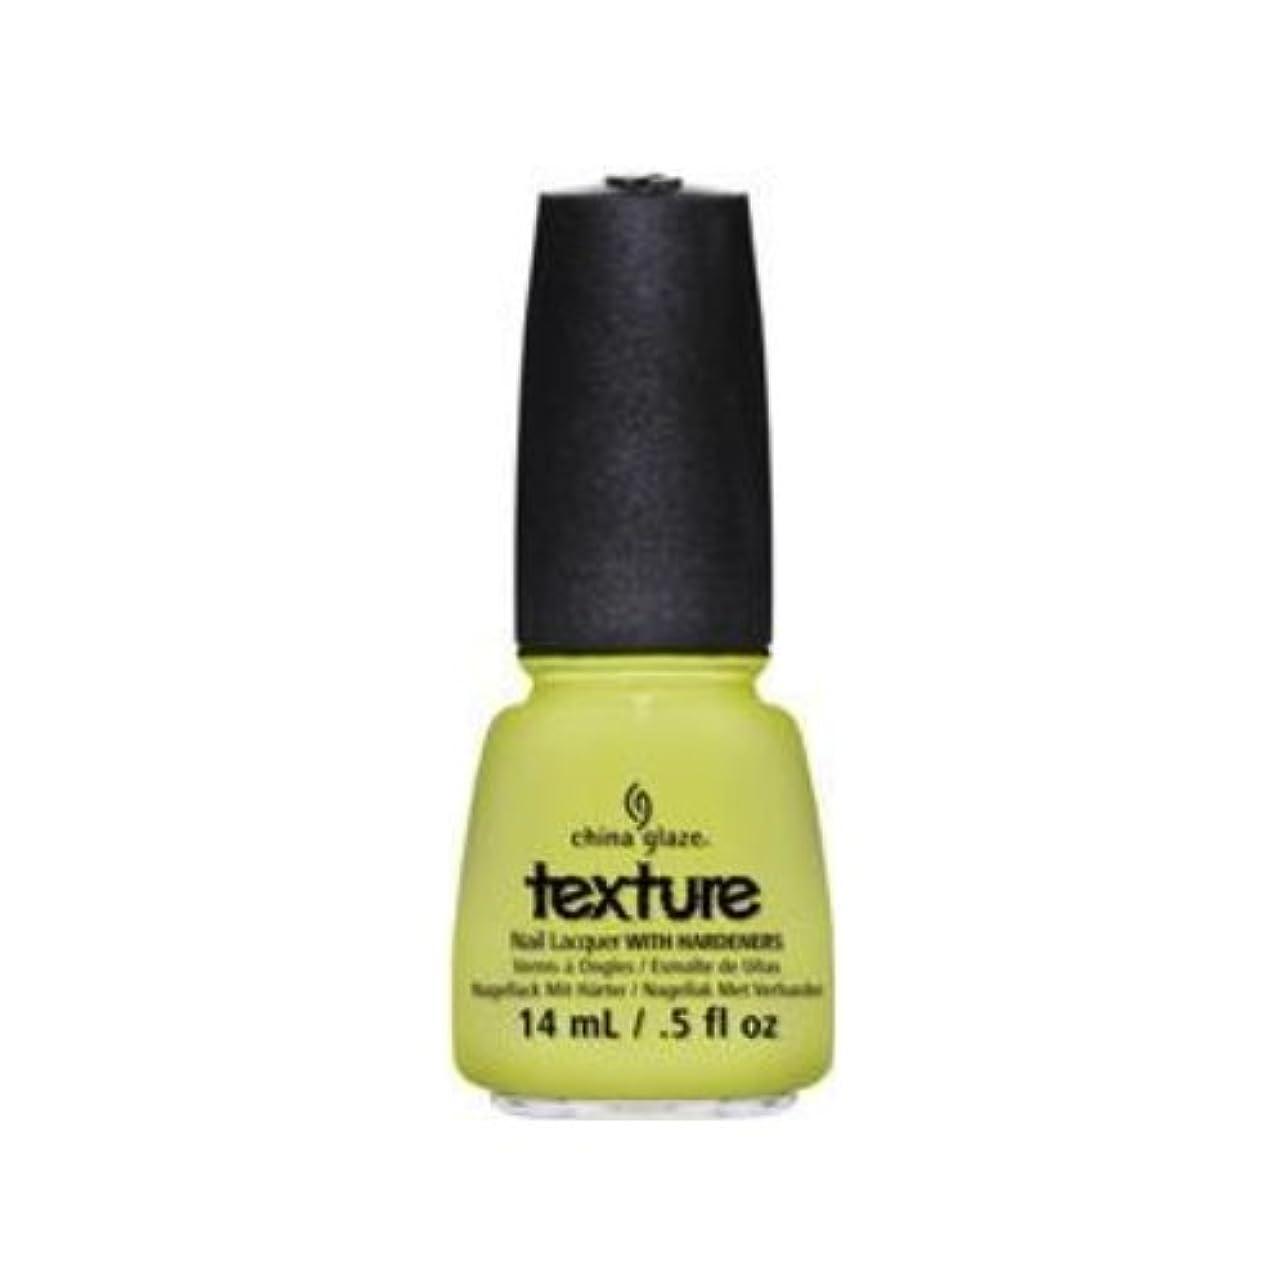 文明化賞合唱団(6 Pack) CHINA GLAZE Texture Nail Lacquers - In The Rough (並行輸入品)